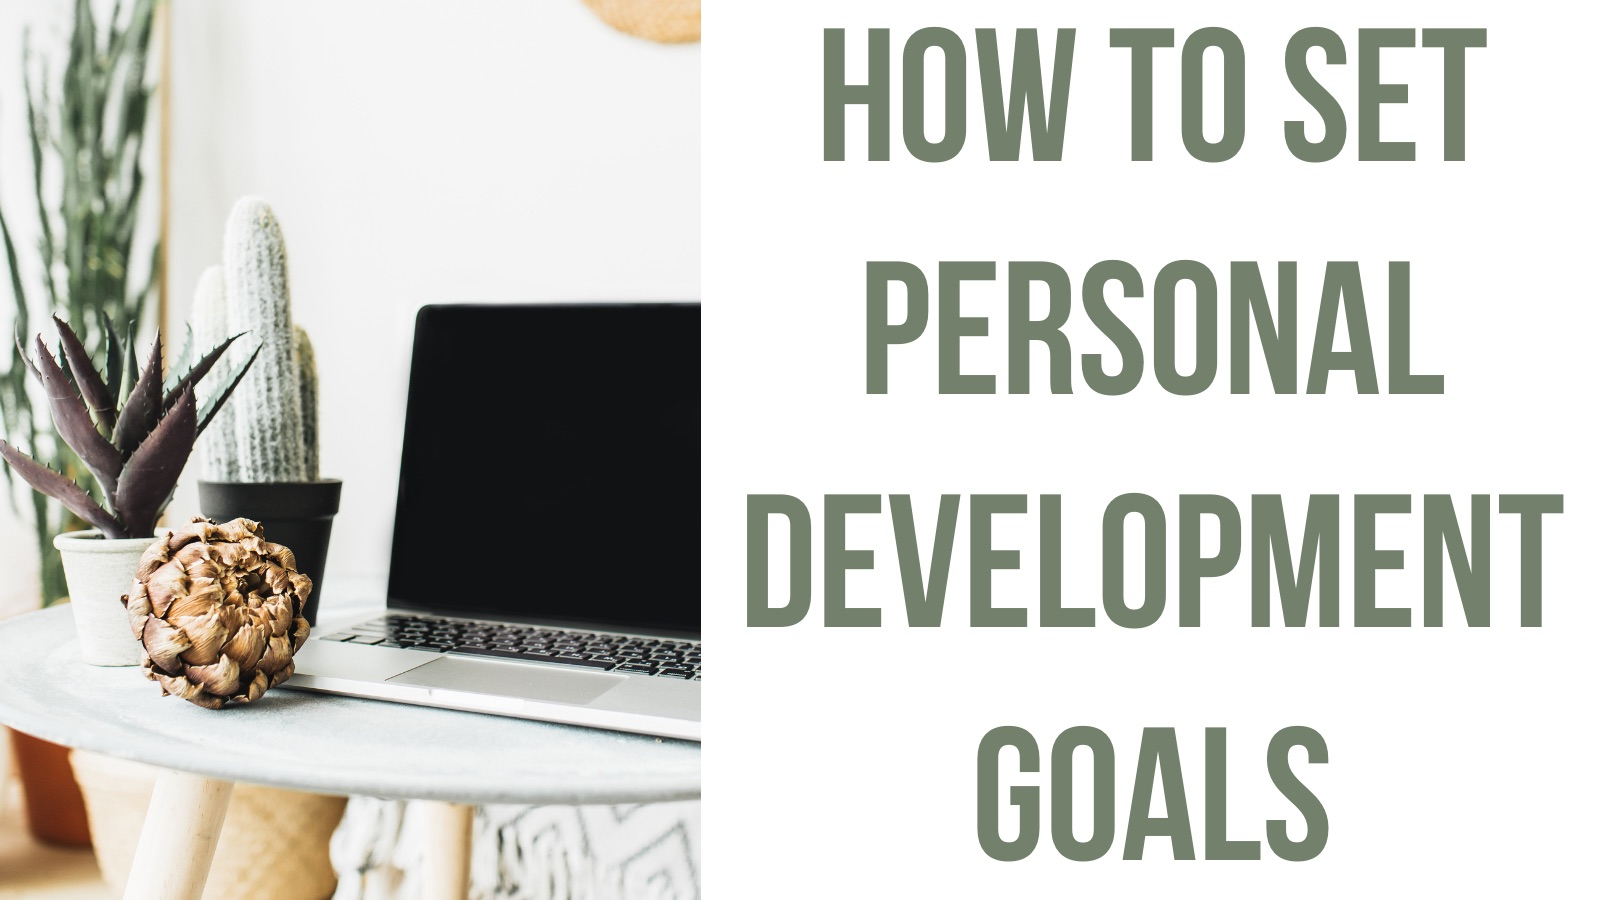 How to set personal development goals!